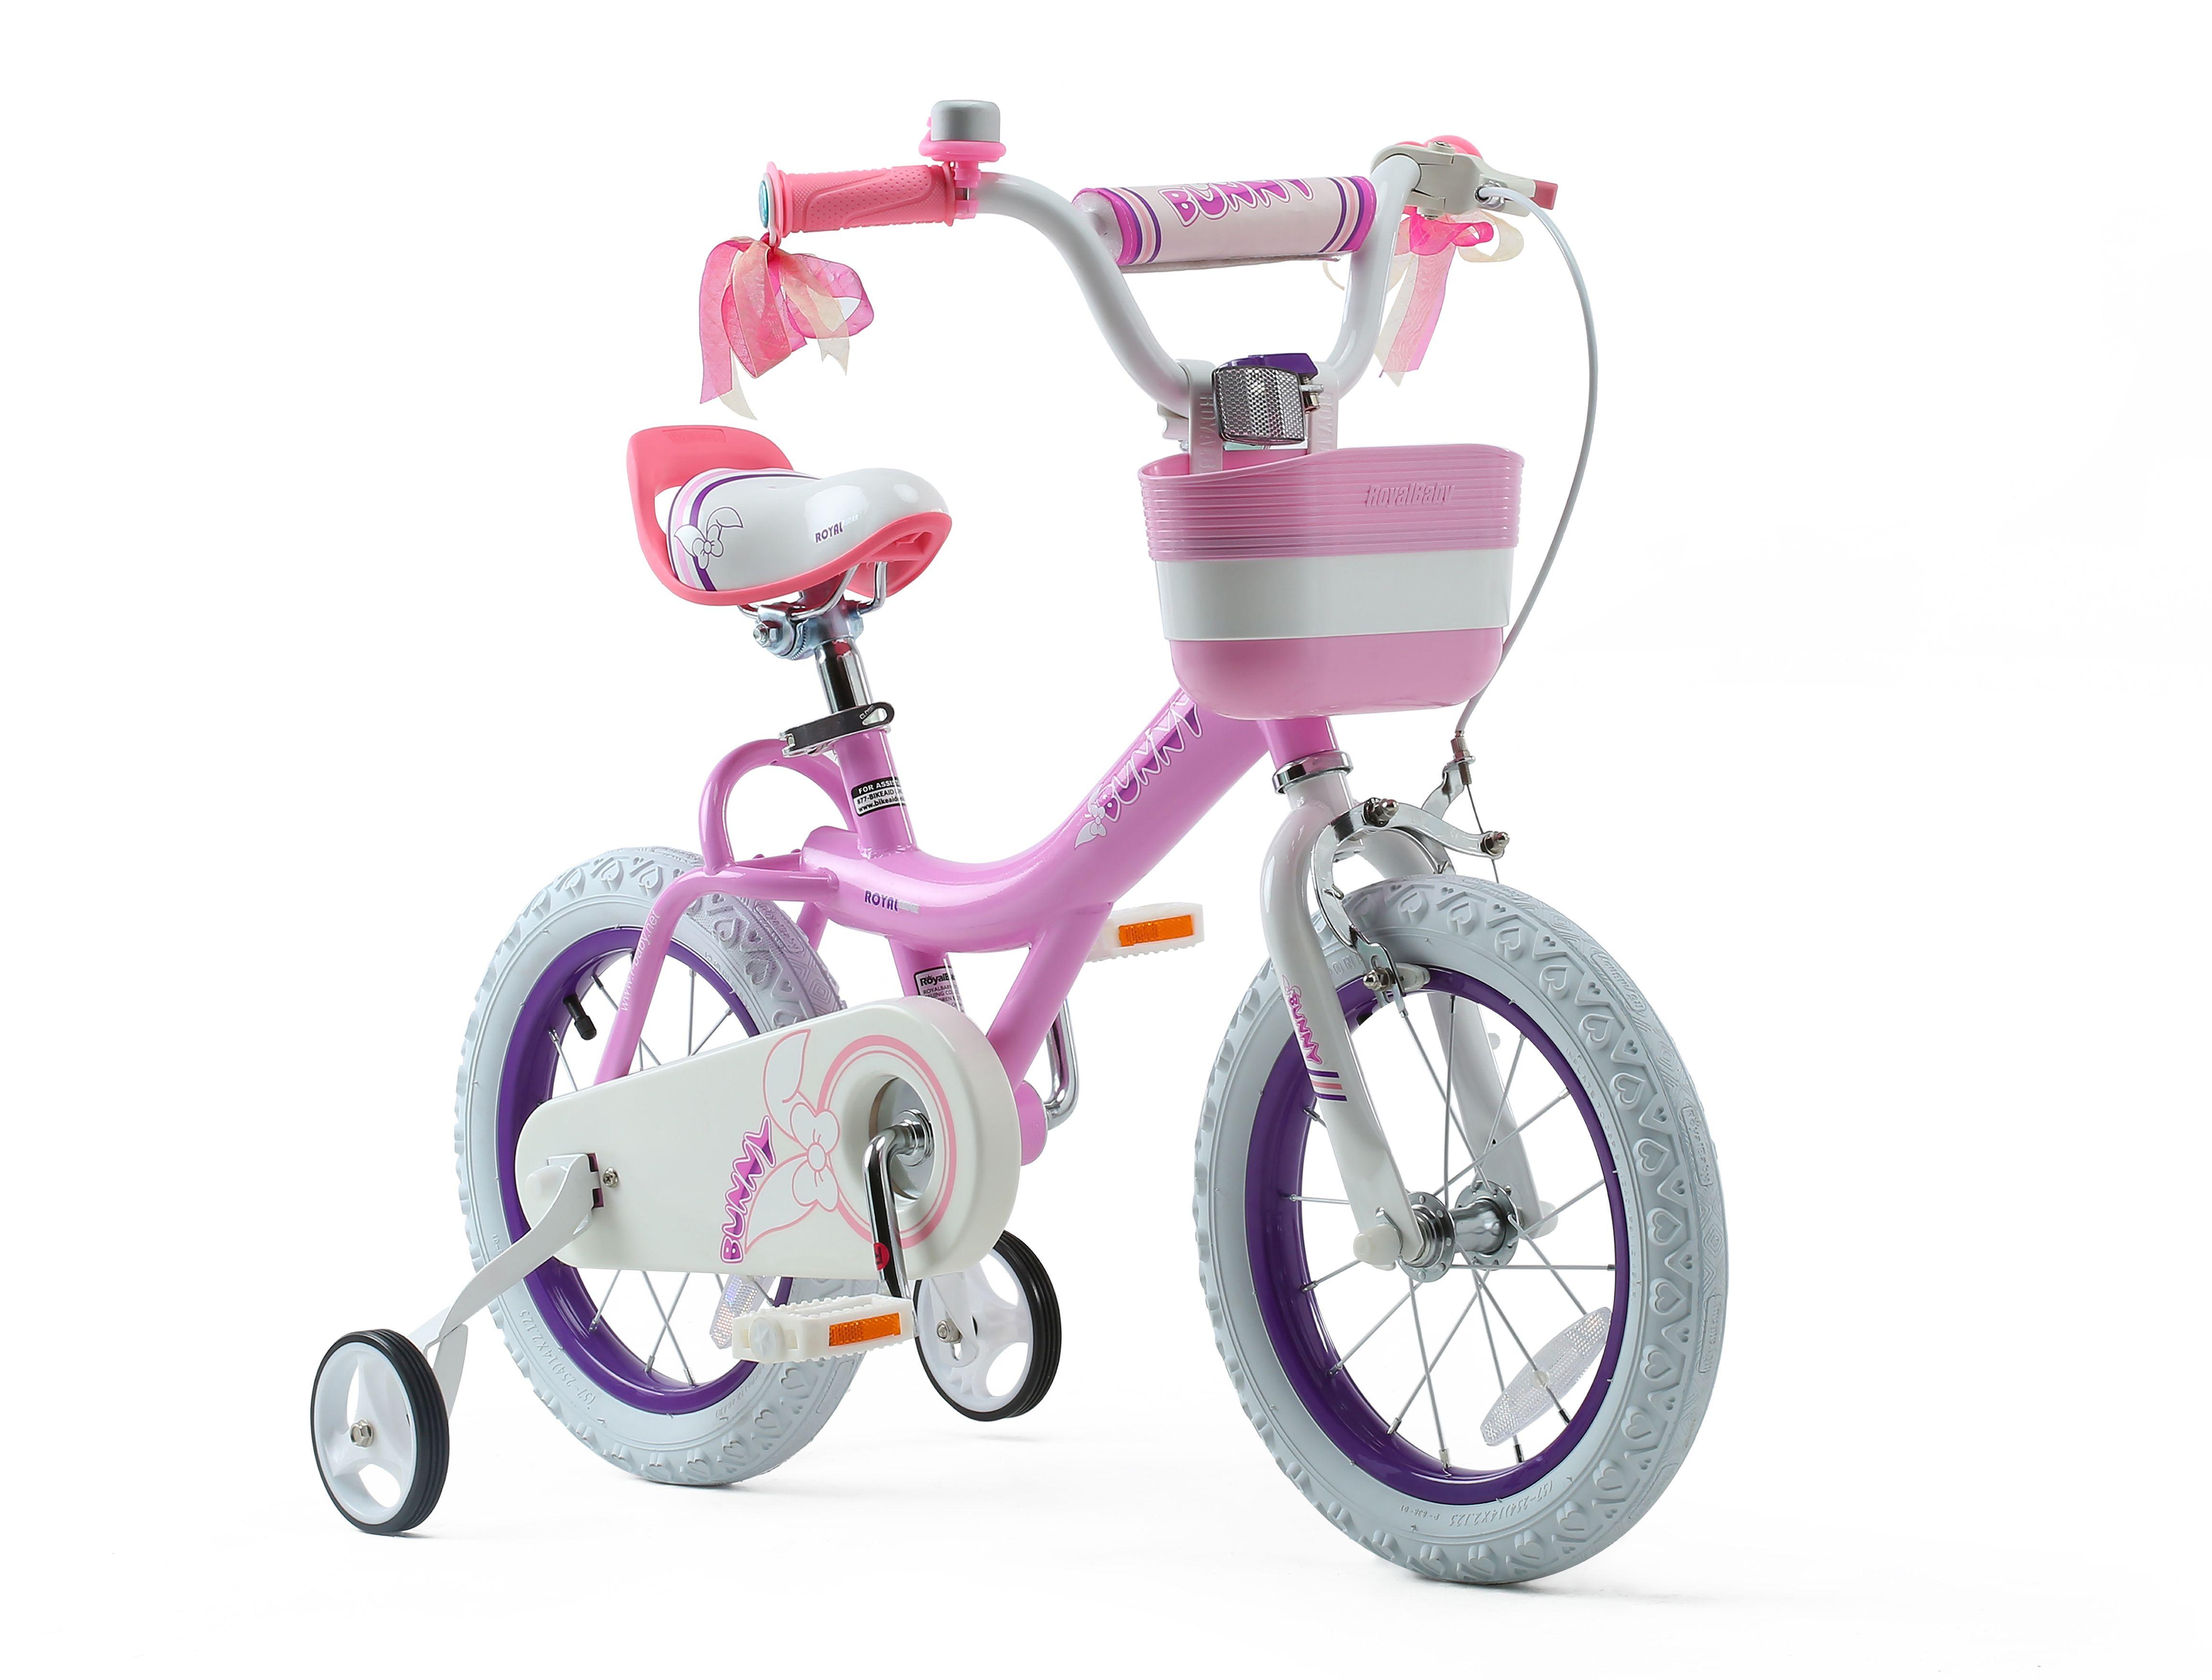 Royalbaby Bunny Girl S Bike Pink 16 Inch Kid S Bicycle Walmart Com In 2020 Kids Bike Kids Bicycle Kids Ride On Toys